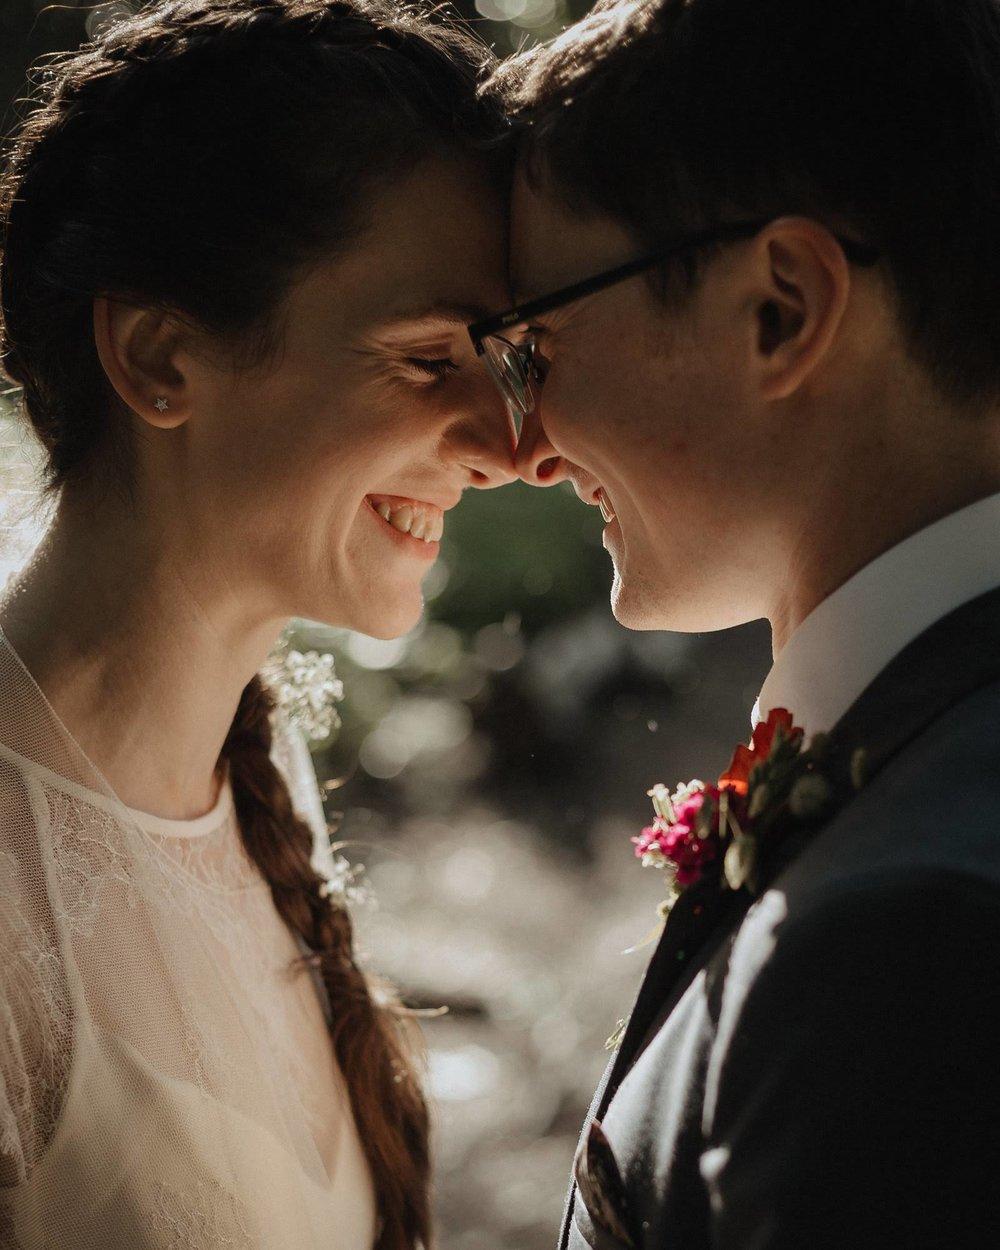 Rowanne-Laid-back-Woodland-Wedding-Sheffield-Clematis-Lace-Silk-Bohemian-Wedding-Gown-Kate-Beaumont-38.jpg